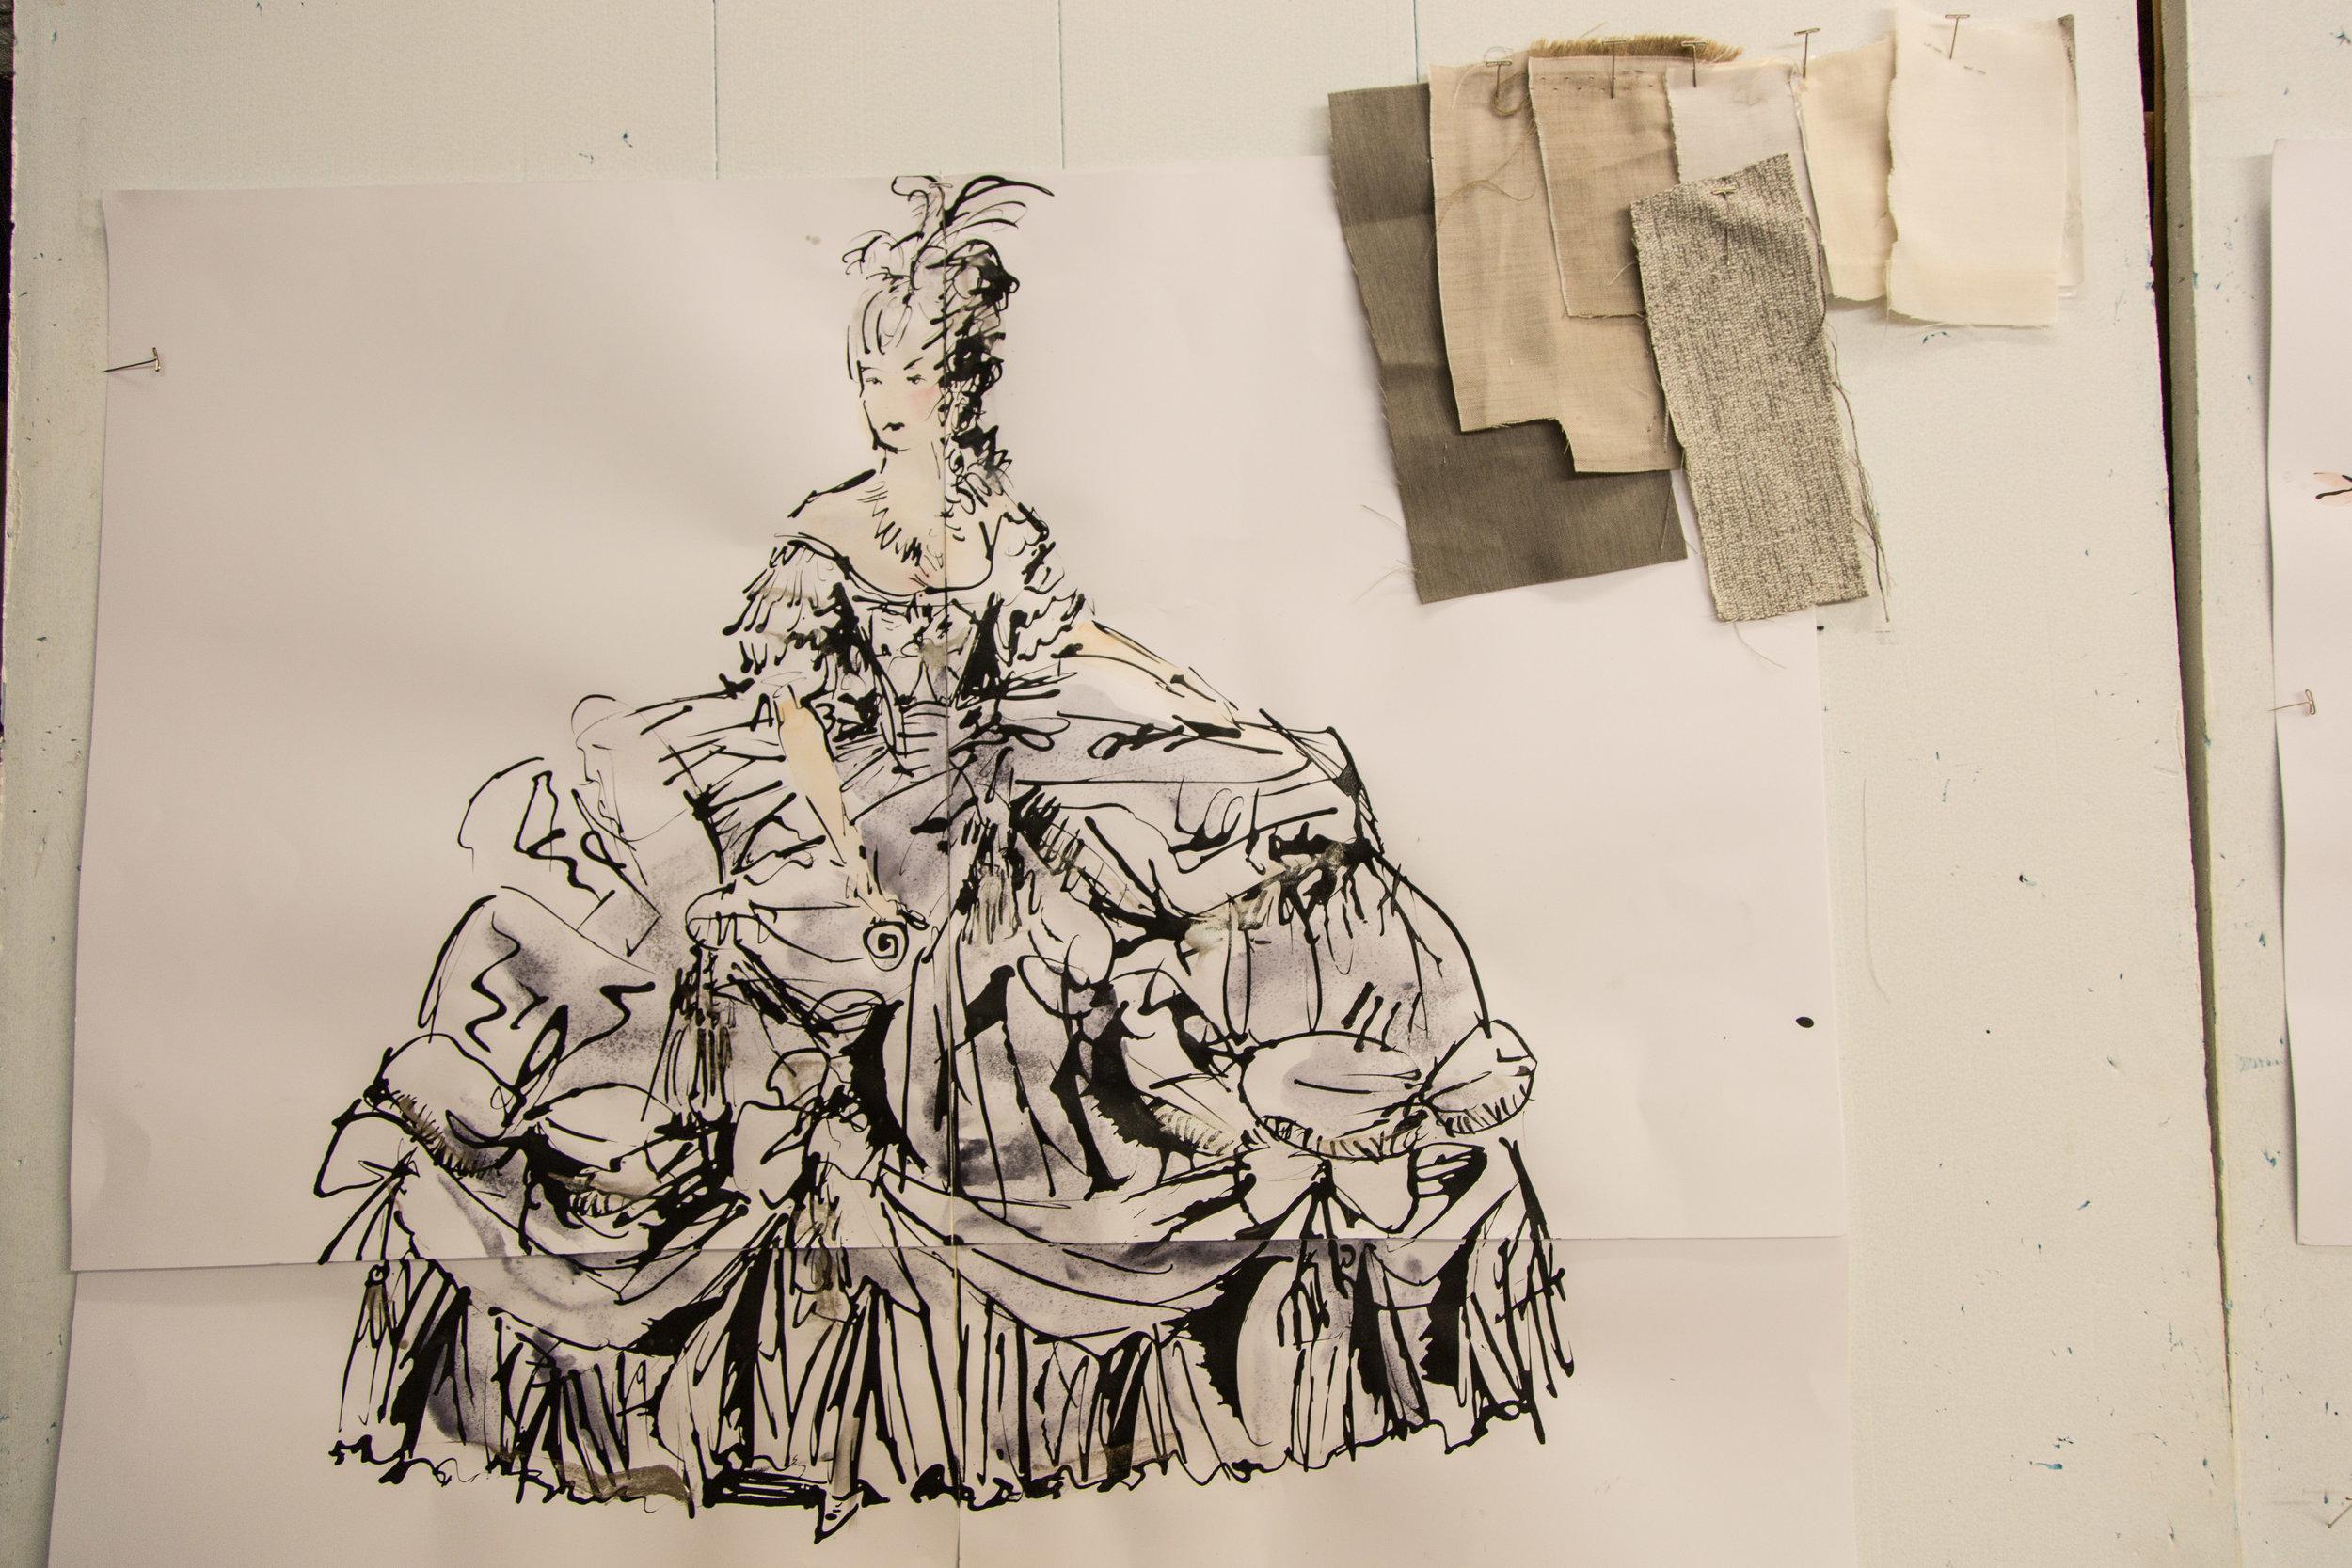 SKETCH INSPIRED BY ELISABETH VIGEE-LEBRUN